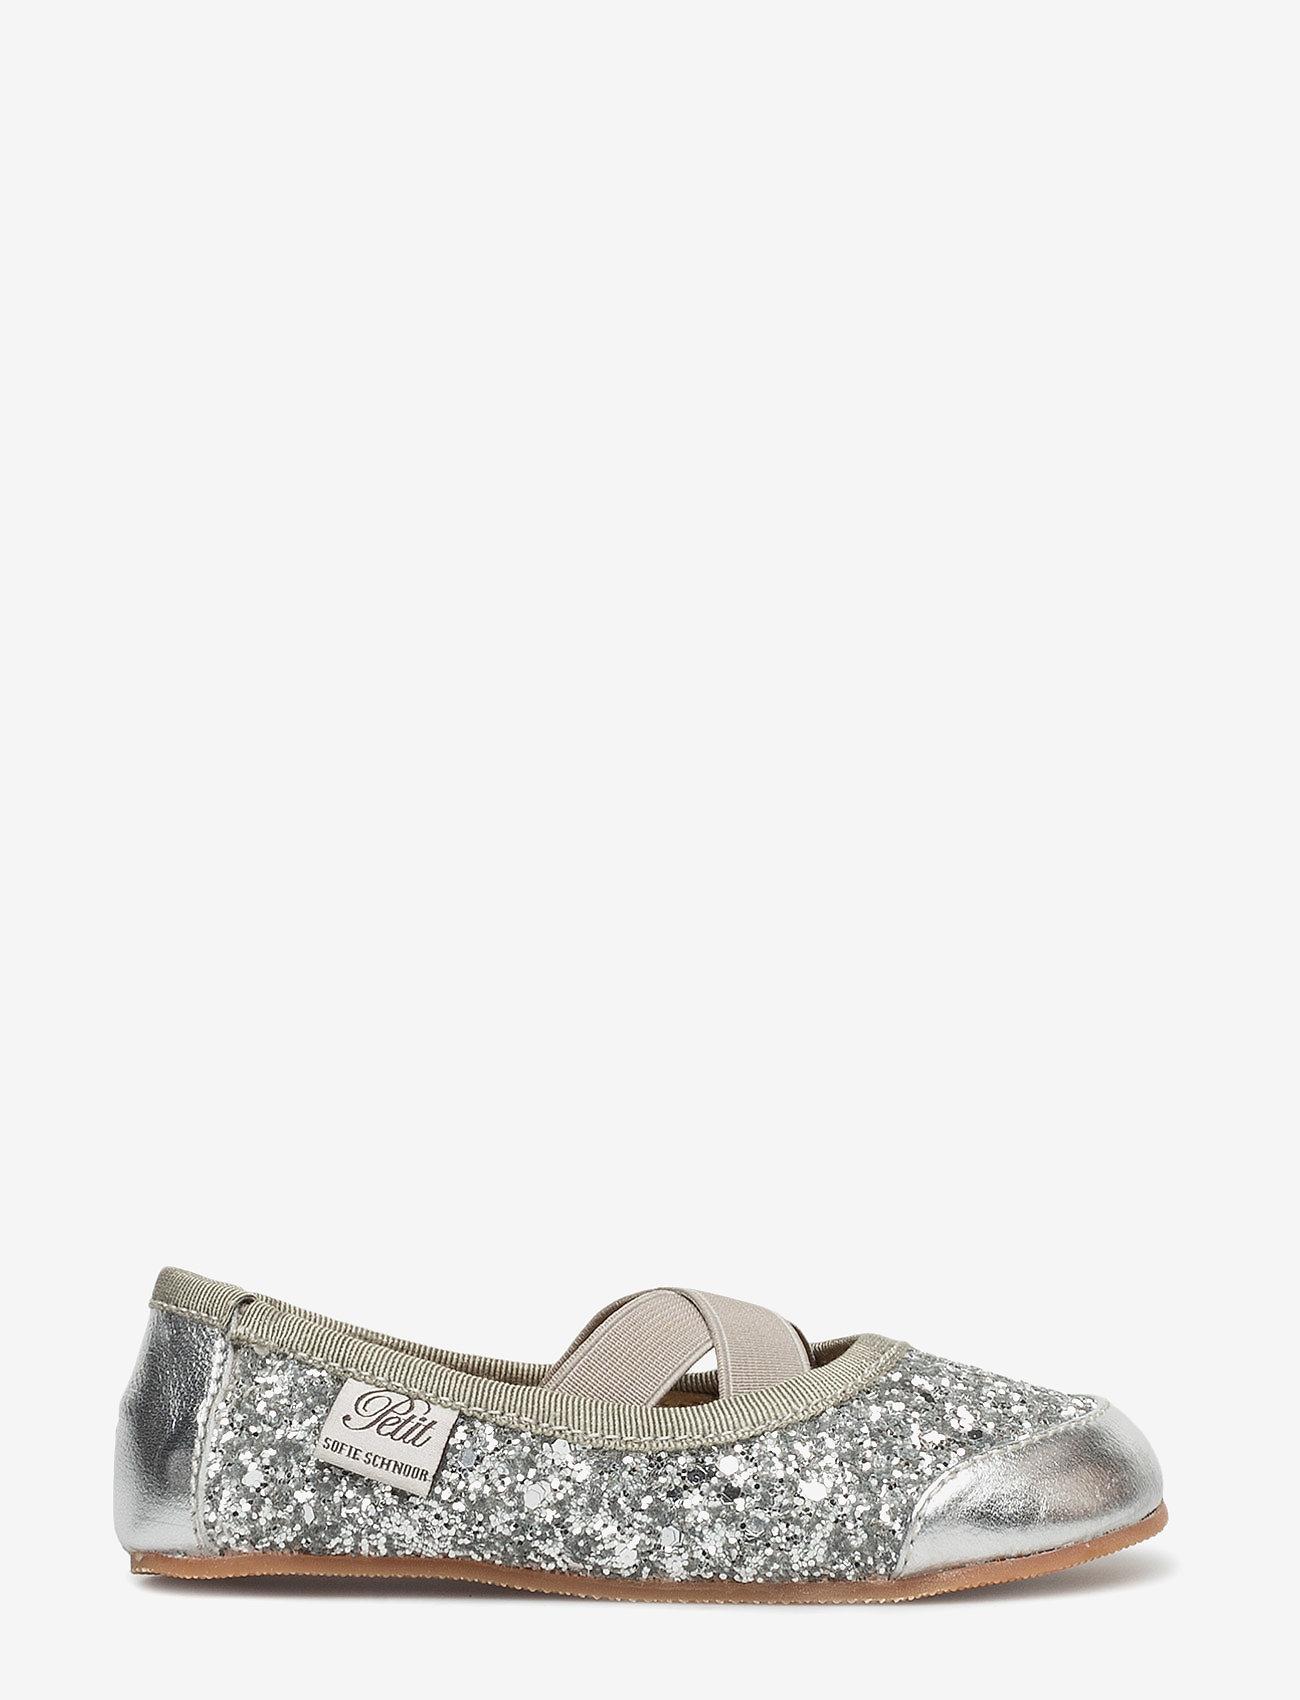 Petit by Sofie Schnoor - Indoors shoe - glitter - hjemmesko - silver - 1